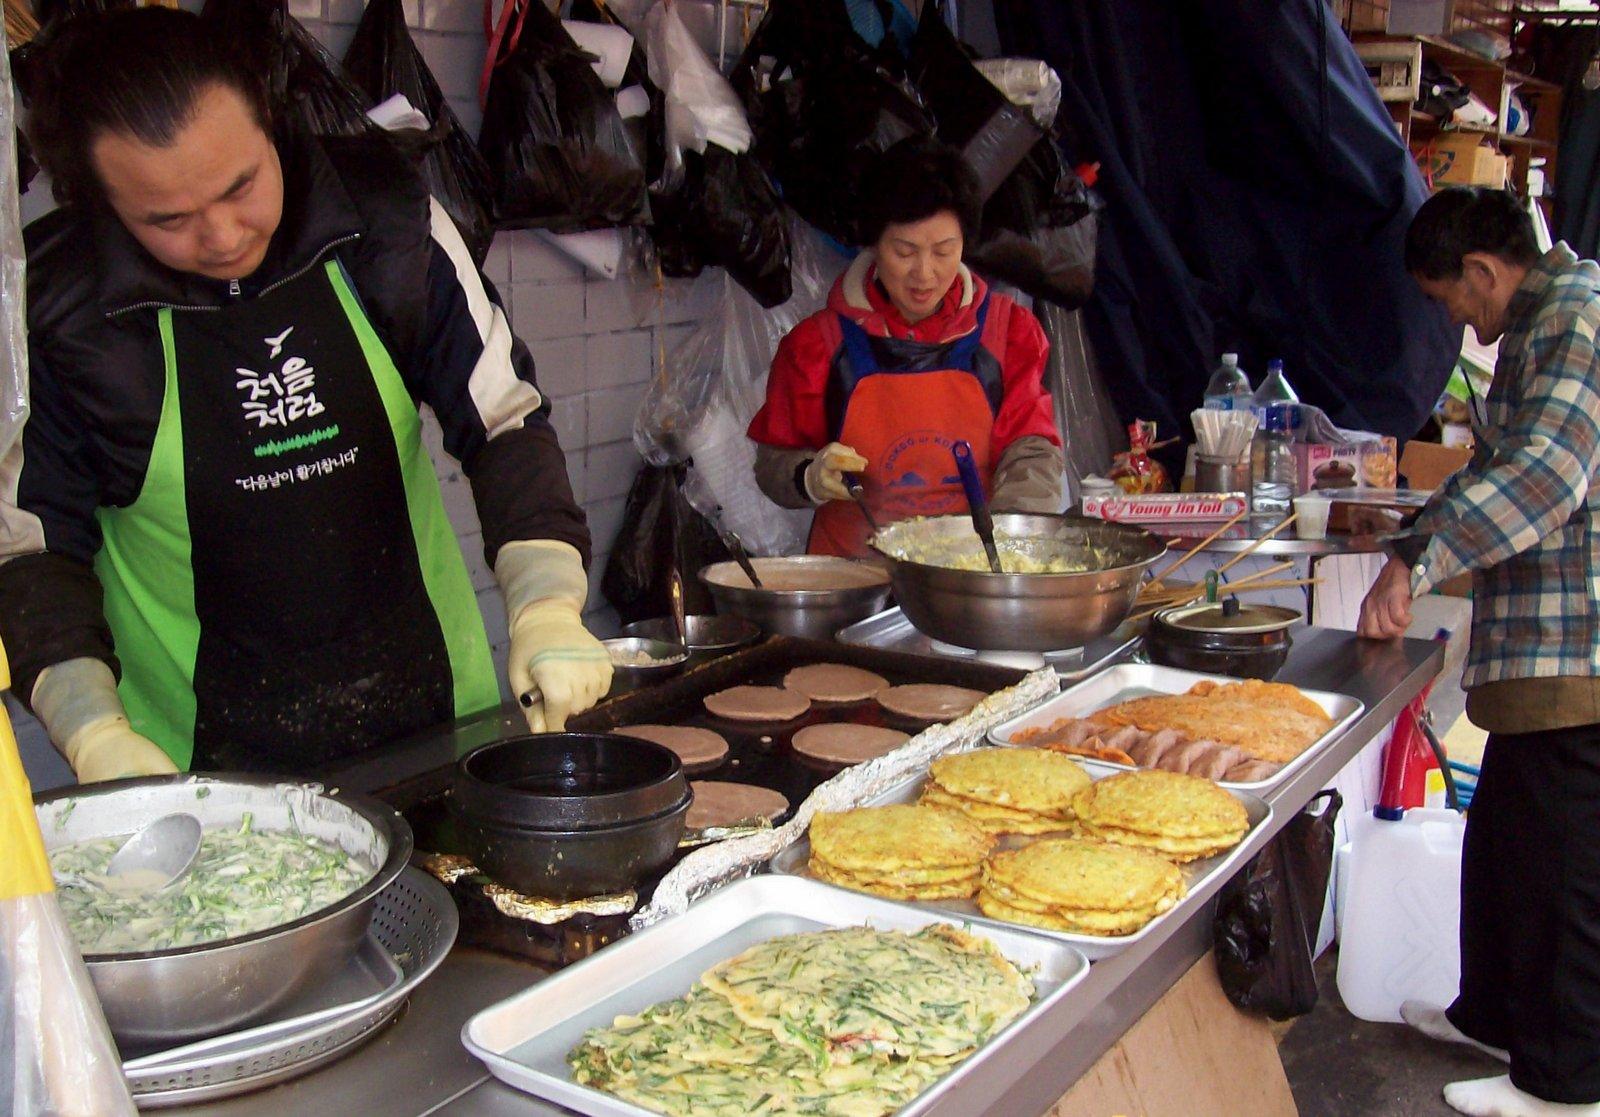 Verkaufsstand für koreanische Omeletts